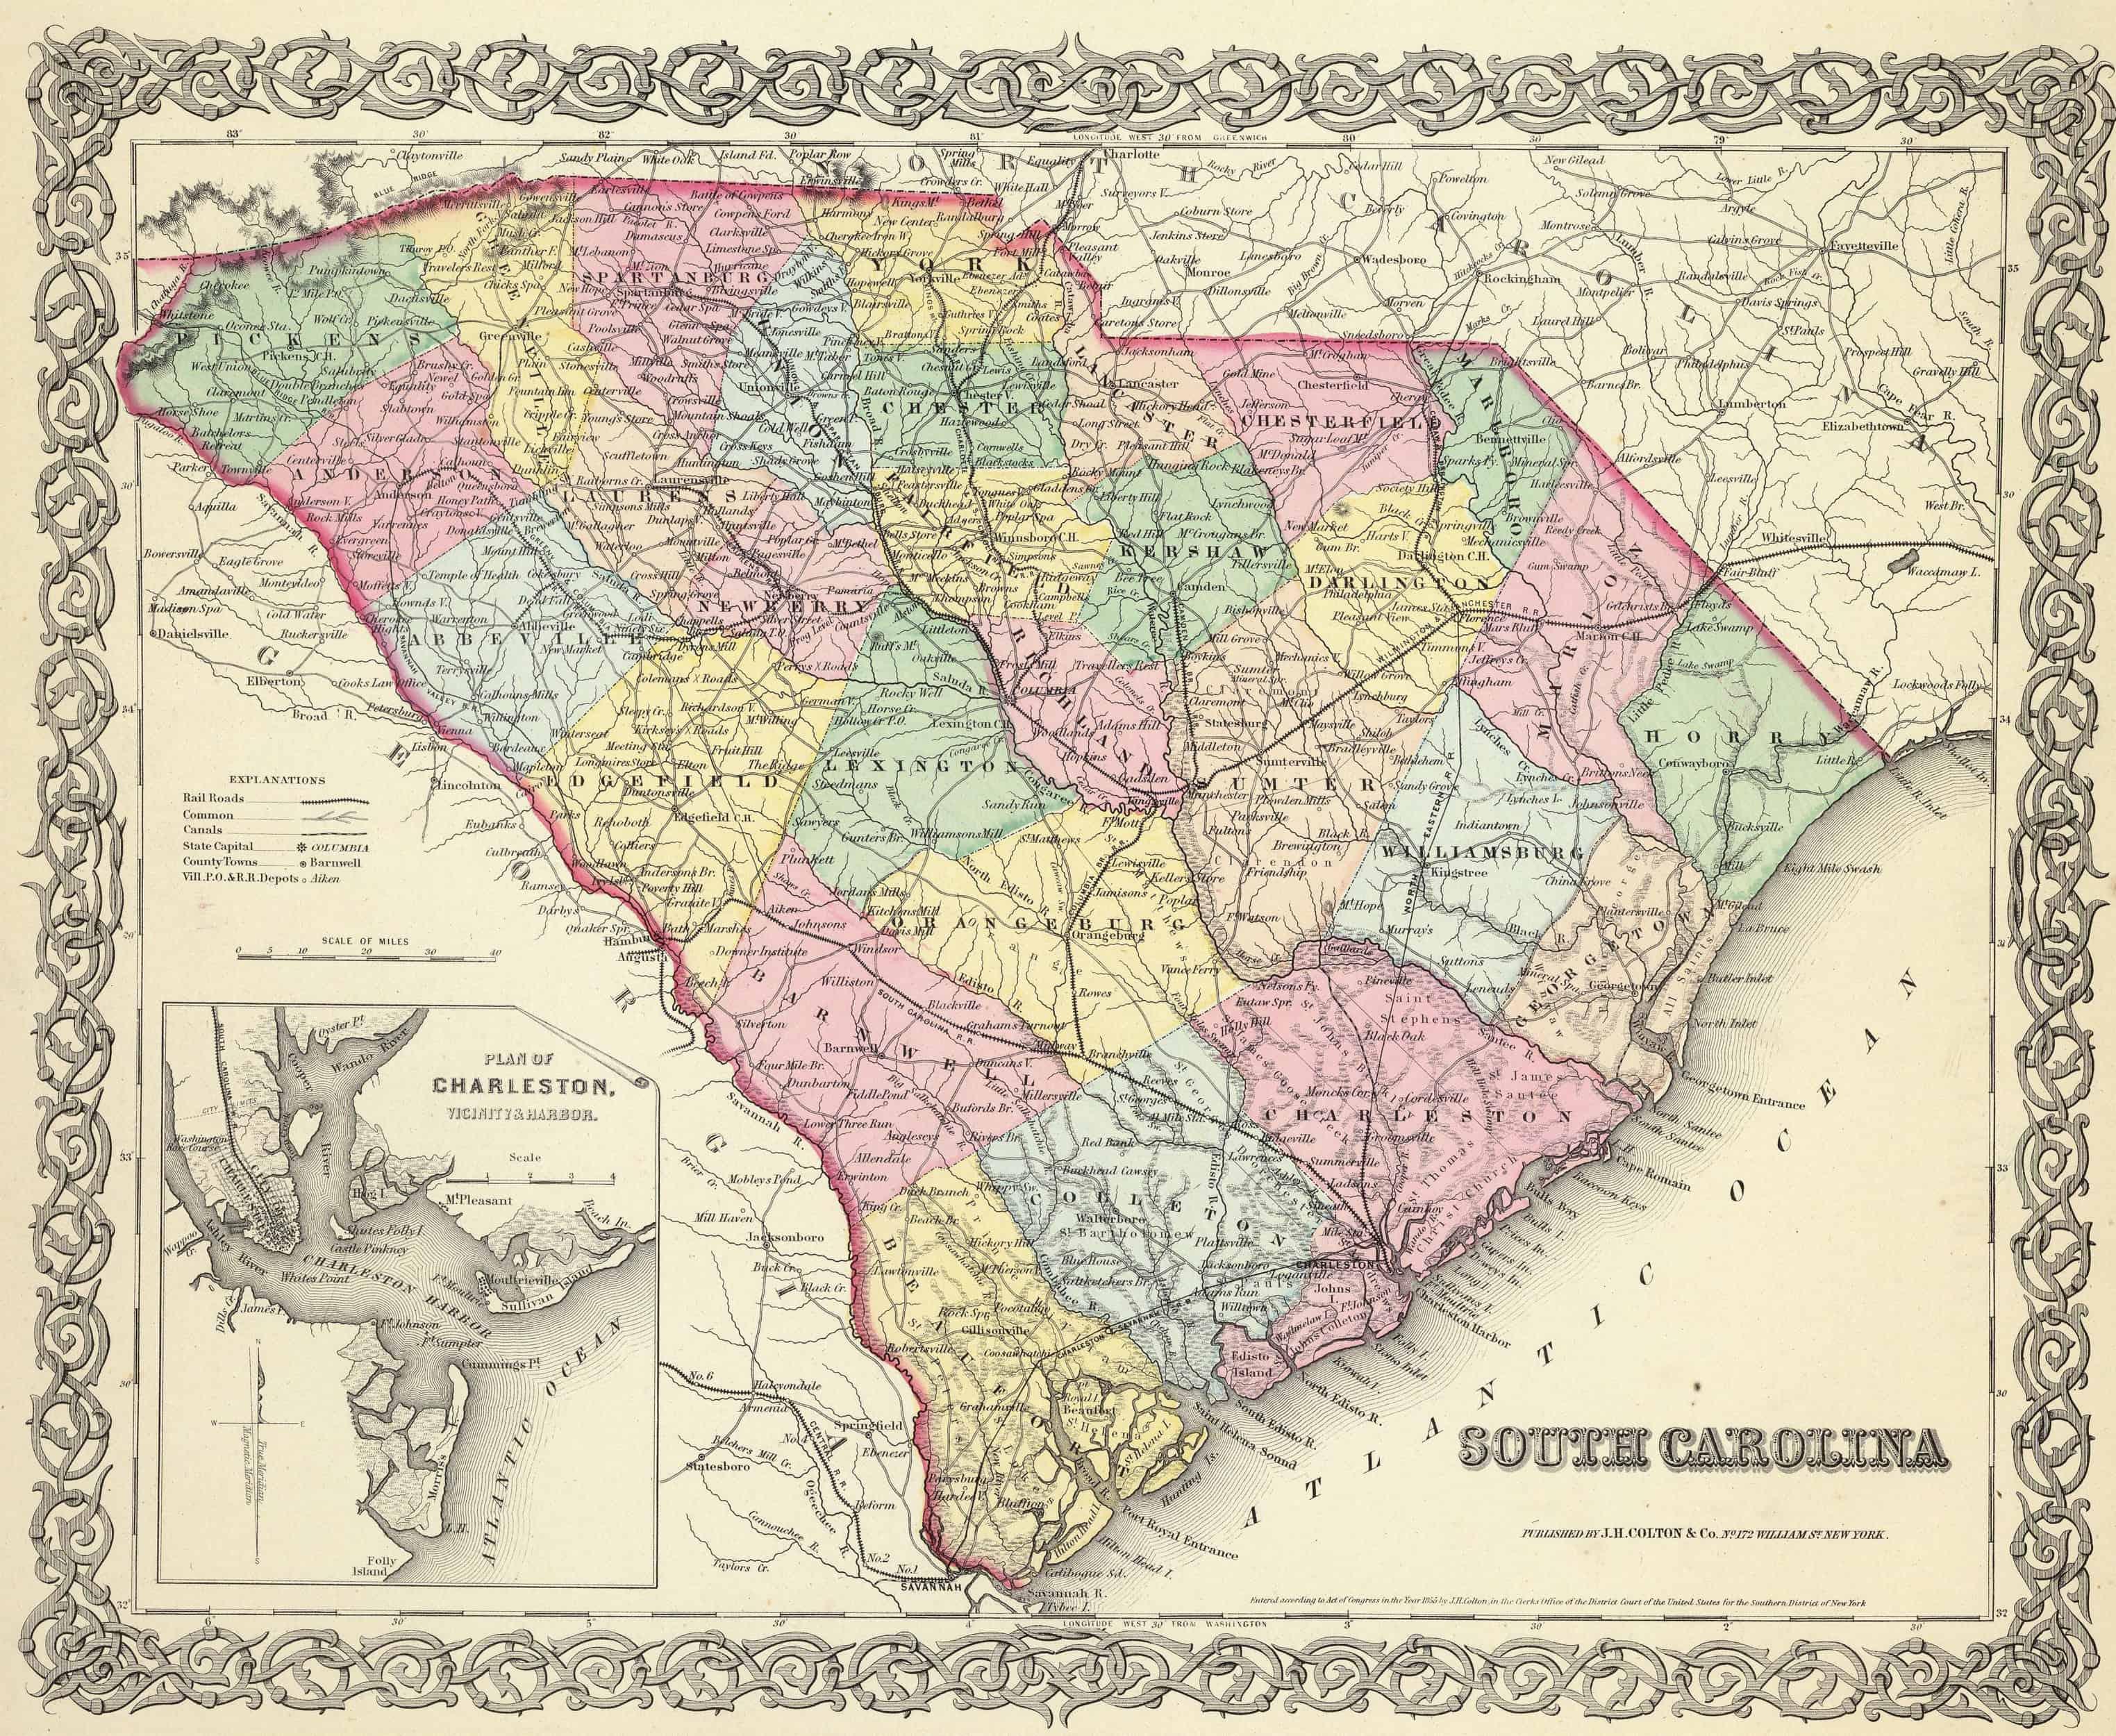 Old Historical City, County and State Maps of South Carolina on virgina map, quebec map, georgia map, arizona map, manitoba map, nova scotia map, guam map, n dakota map, munich s-bahn map, clemson map, north dakota map, ohio map, miami map, district of columbia map, minnesota map, conn map, iowa map, houston map, nc state map, central fl map,